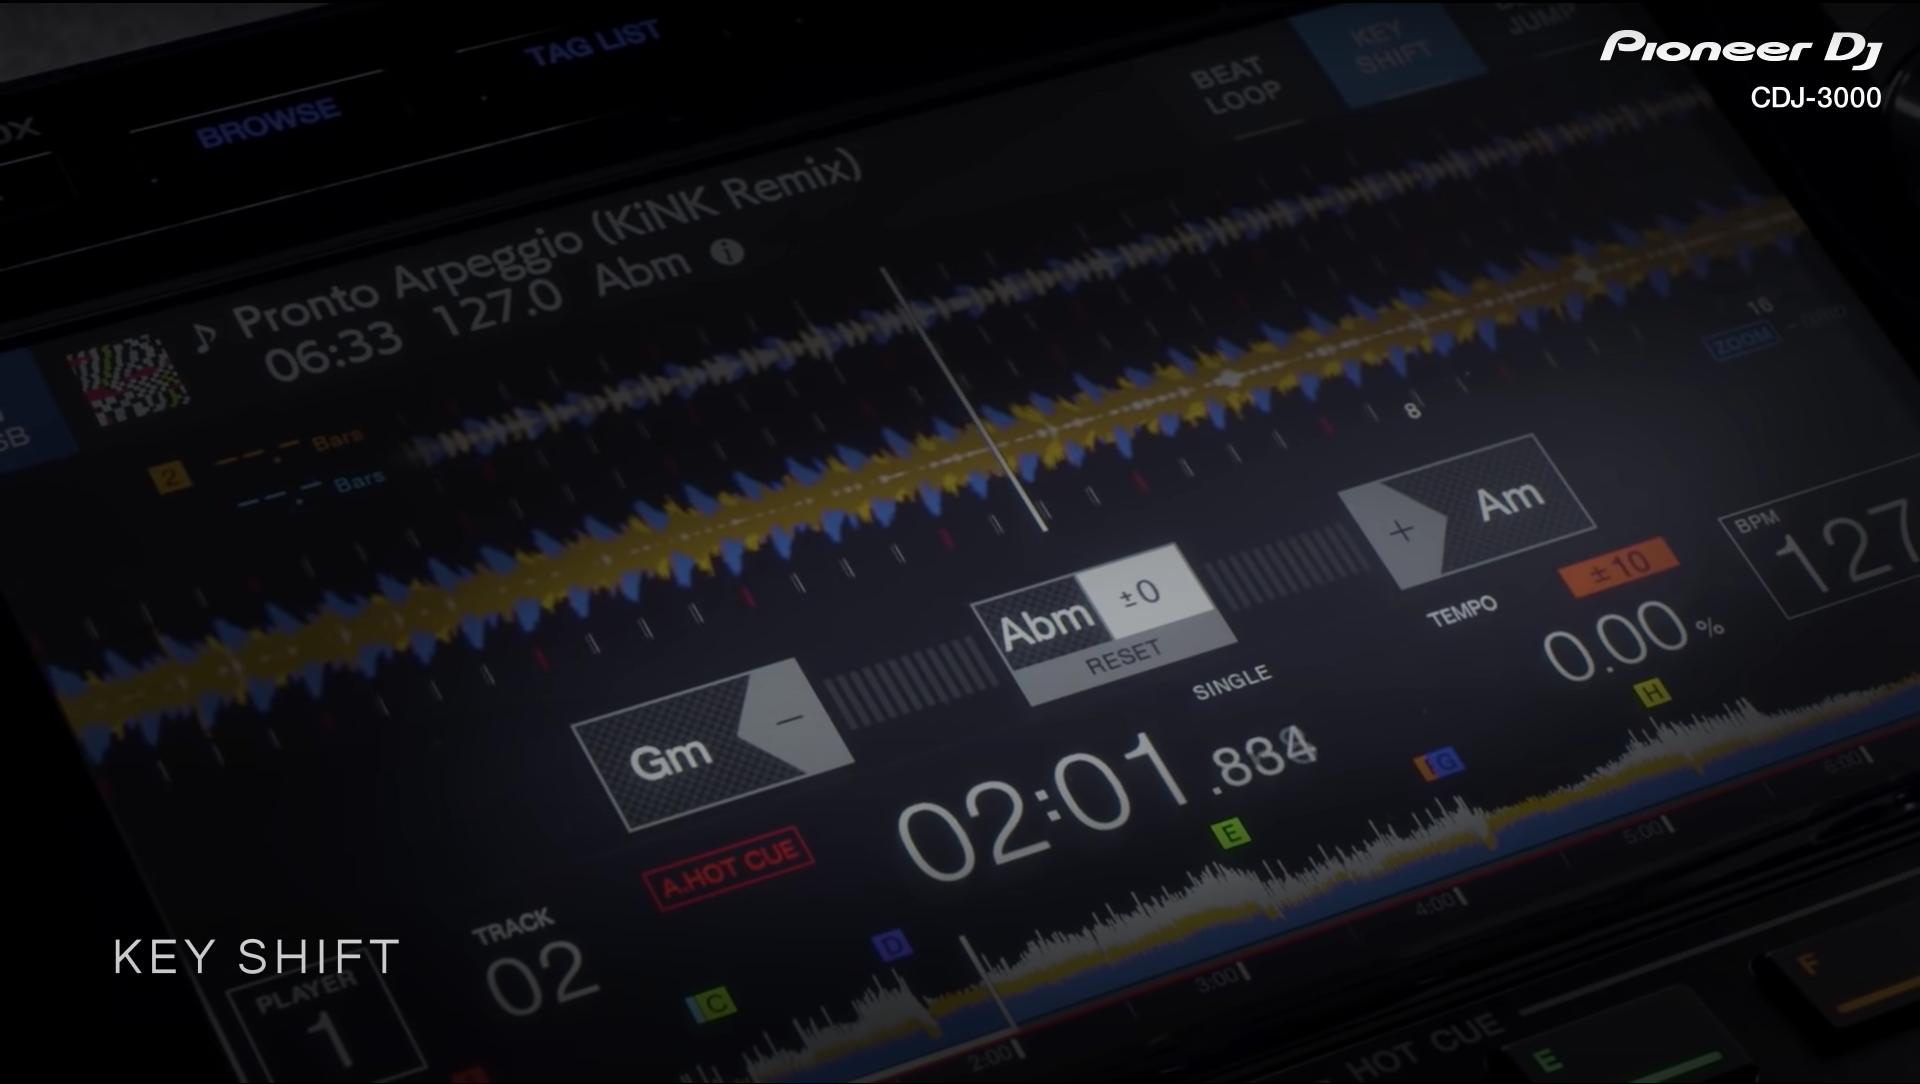 CDJ-3000 KEY SHIFT GUI